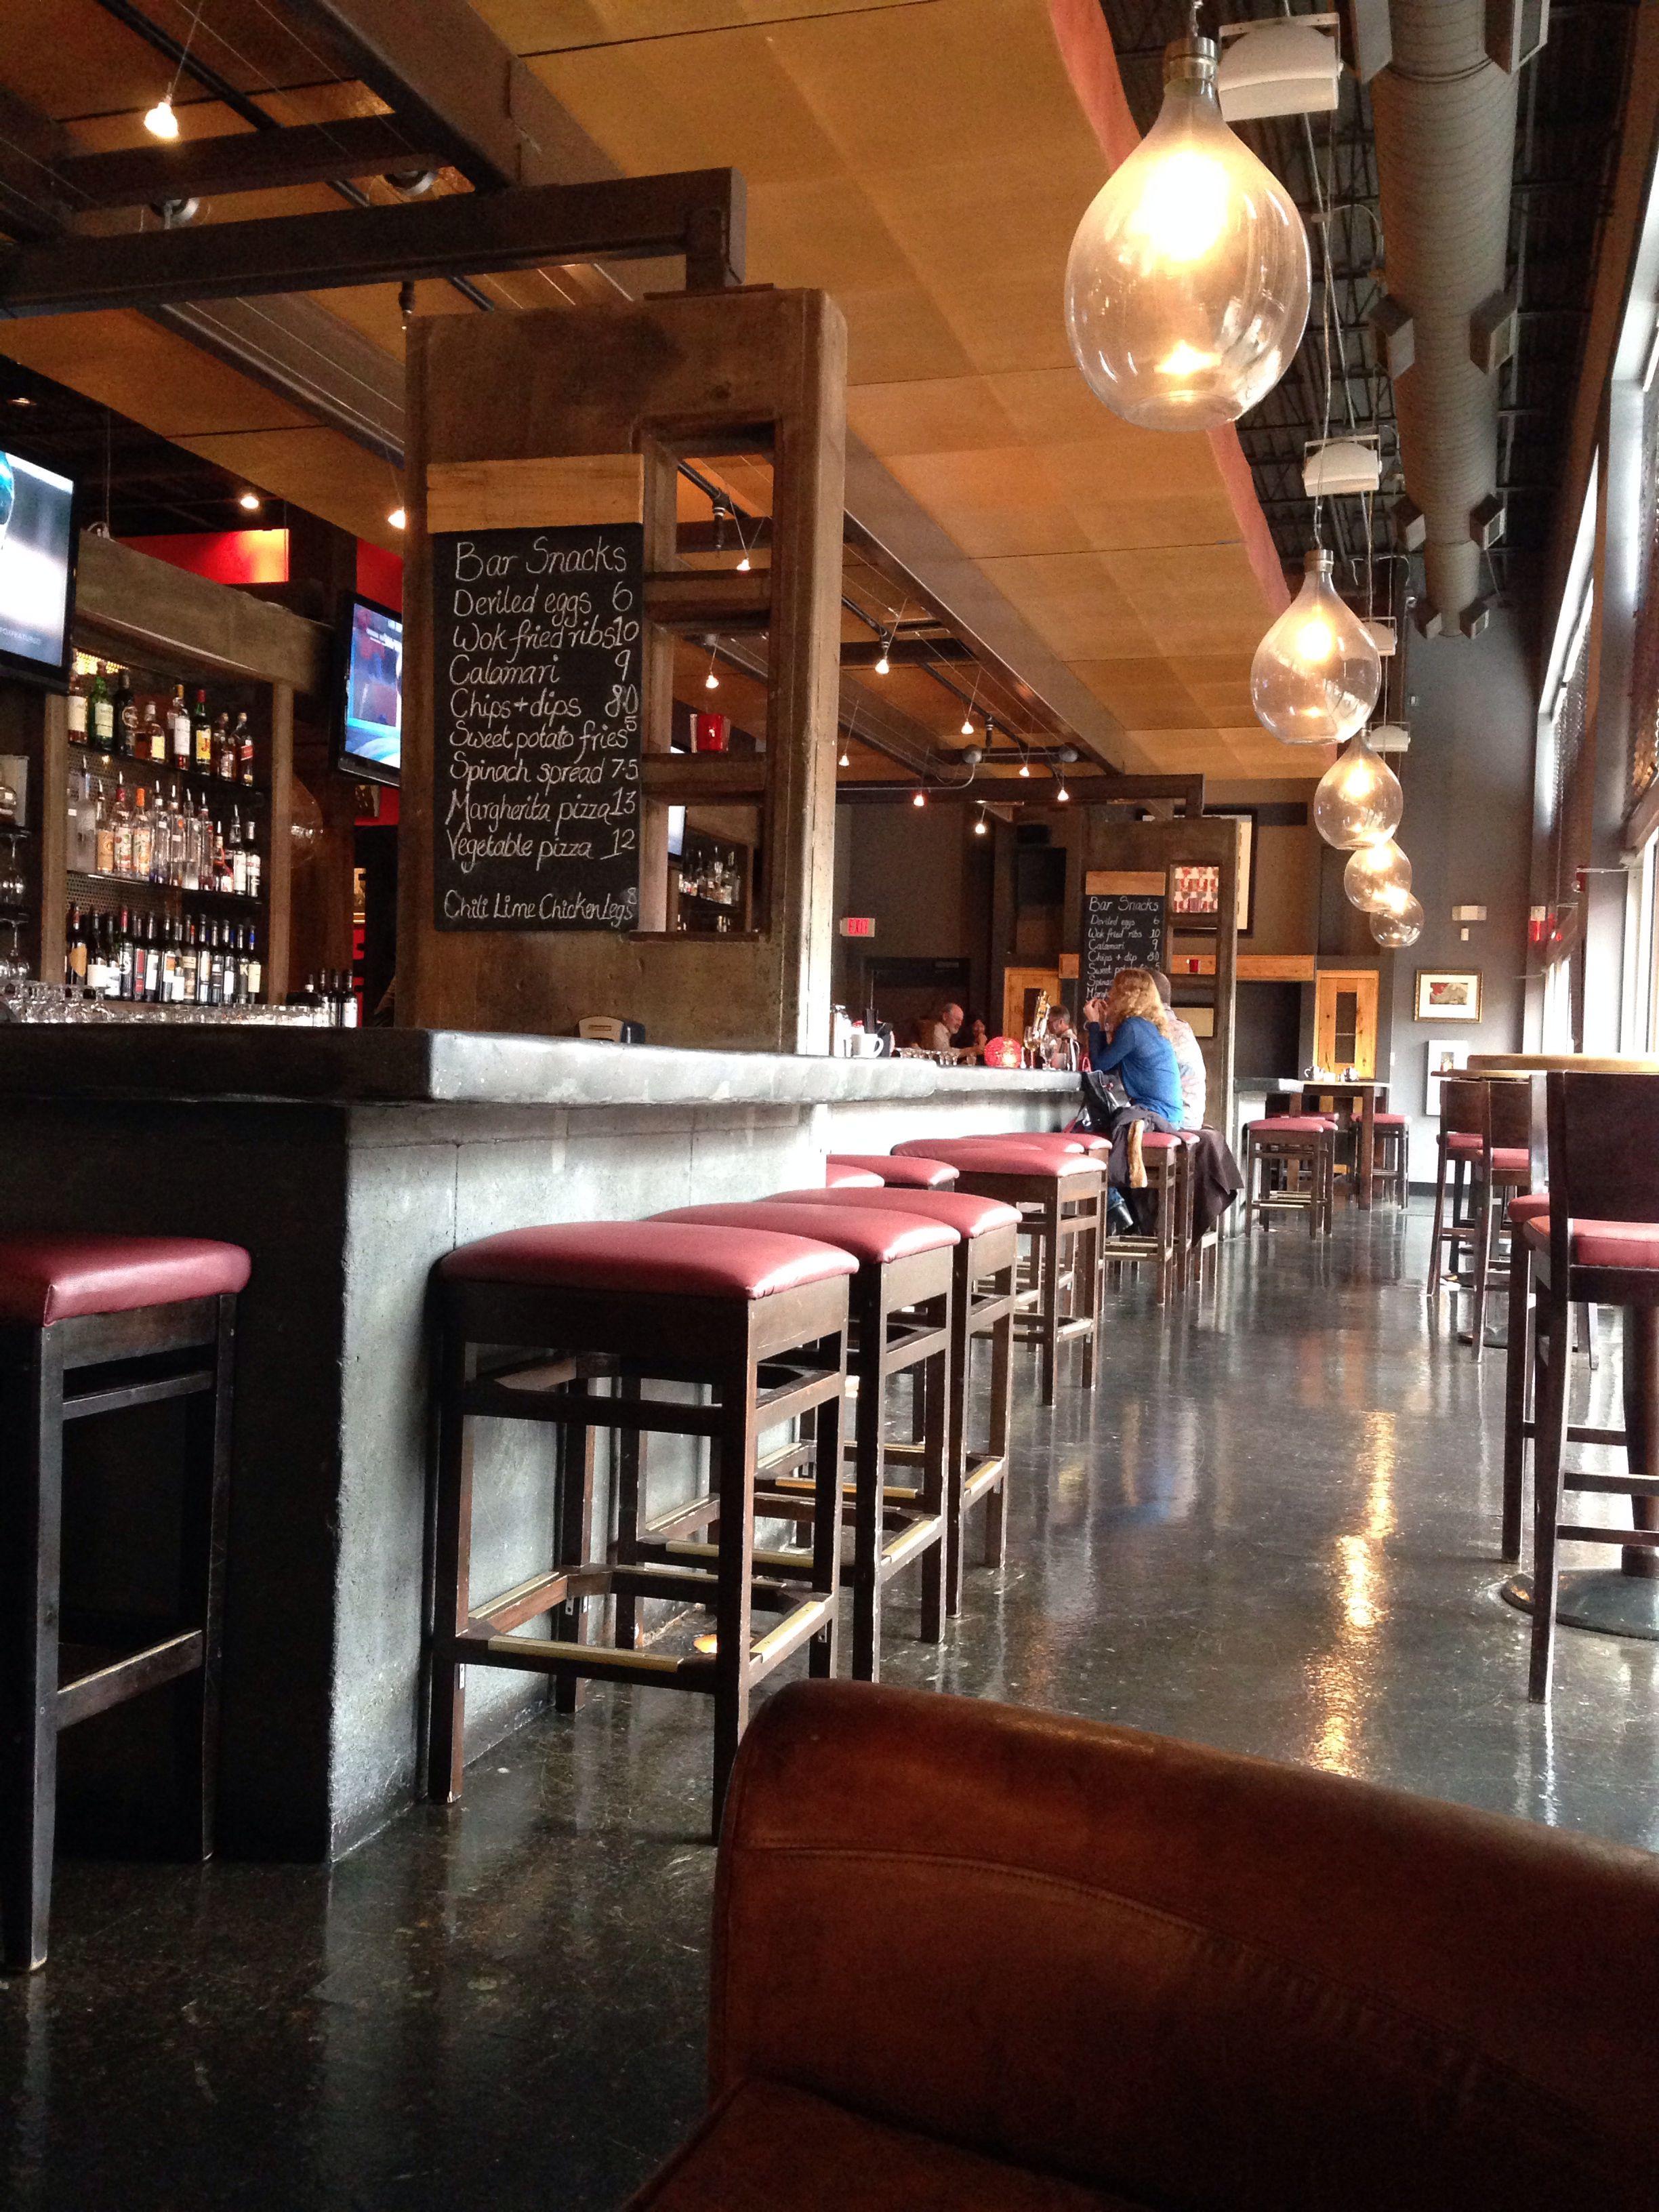 City Kitchen. Chapel Hill, NC | Durham, NC | Pinterest | Chapel hill ...